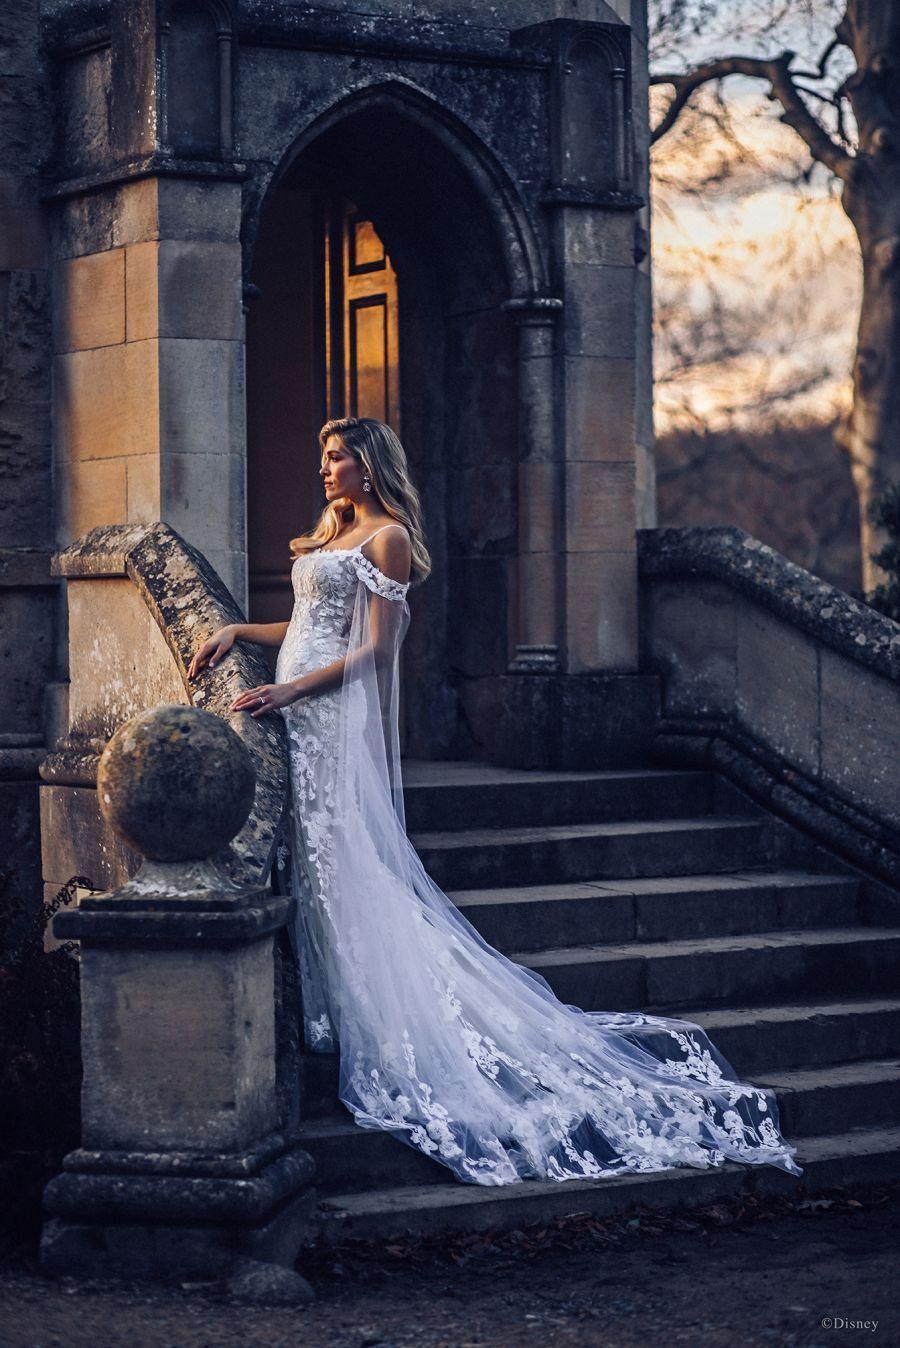 Rapunzel Floral Lace Cold Shoulder Sheath Gown Illusion Cape Sleeves In 2021 Rapunzel Wedding Dress Allure Bridal Disney Fairy Tale Weddings [ 1348 x 900 Pixel ]